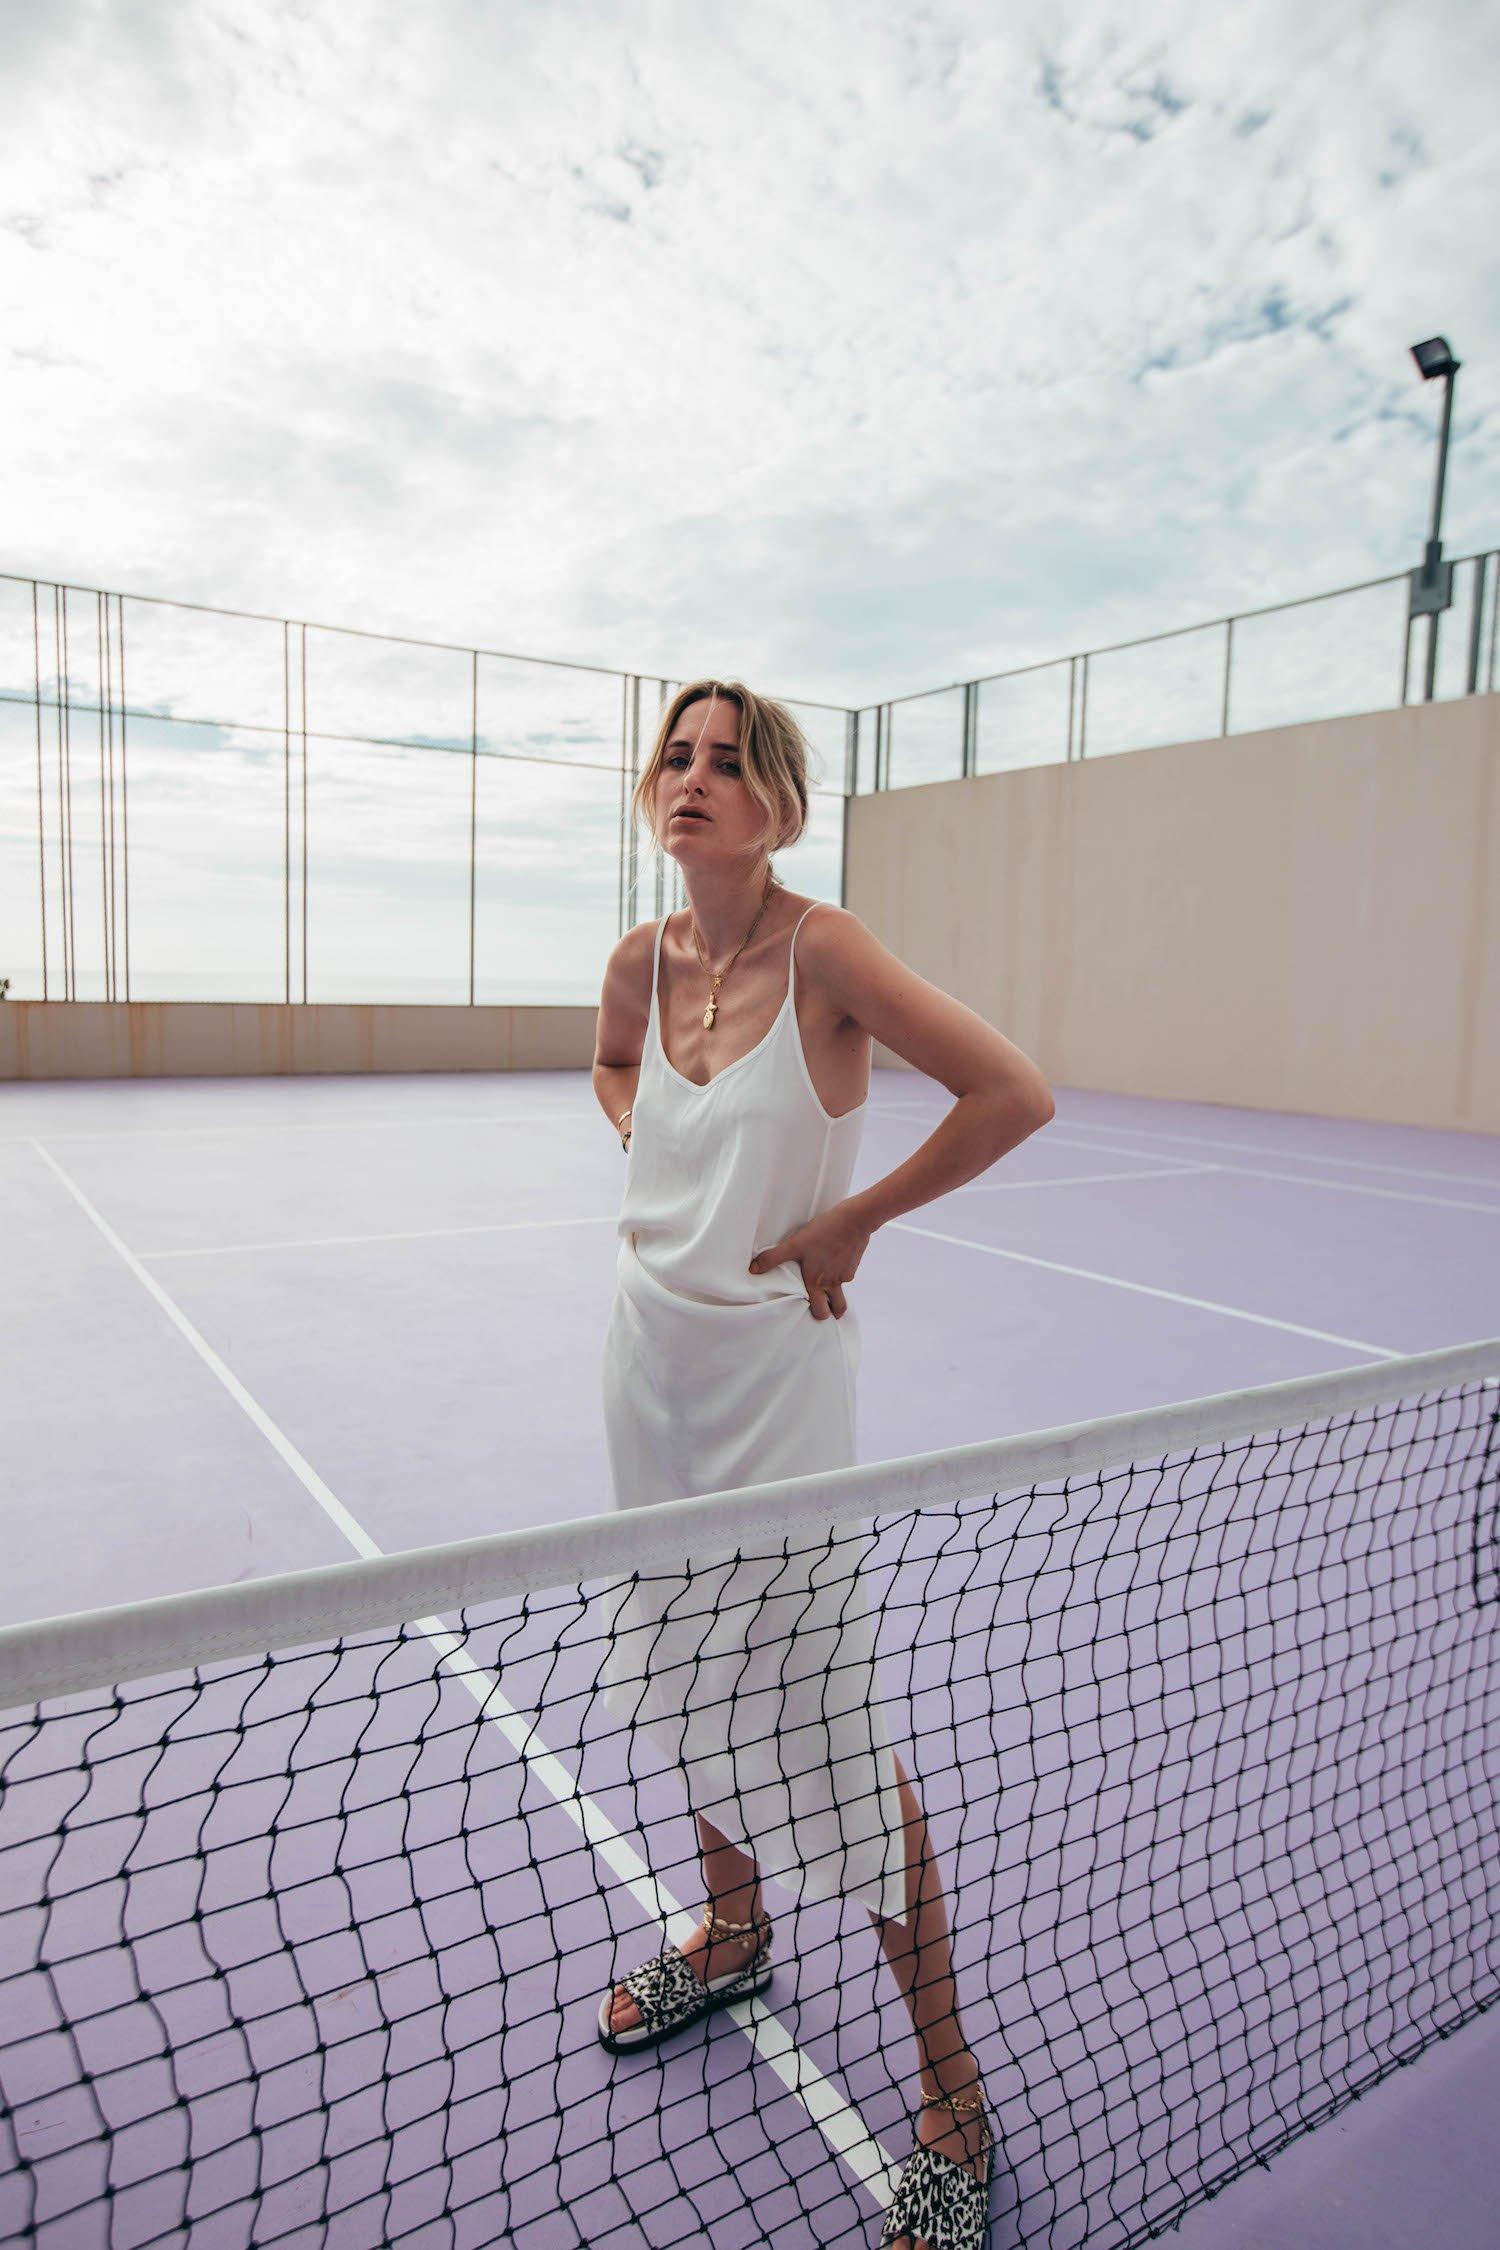 SLIP DRESS TENNIS COURT